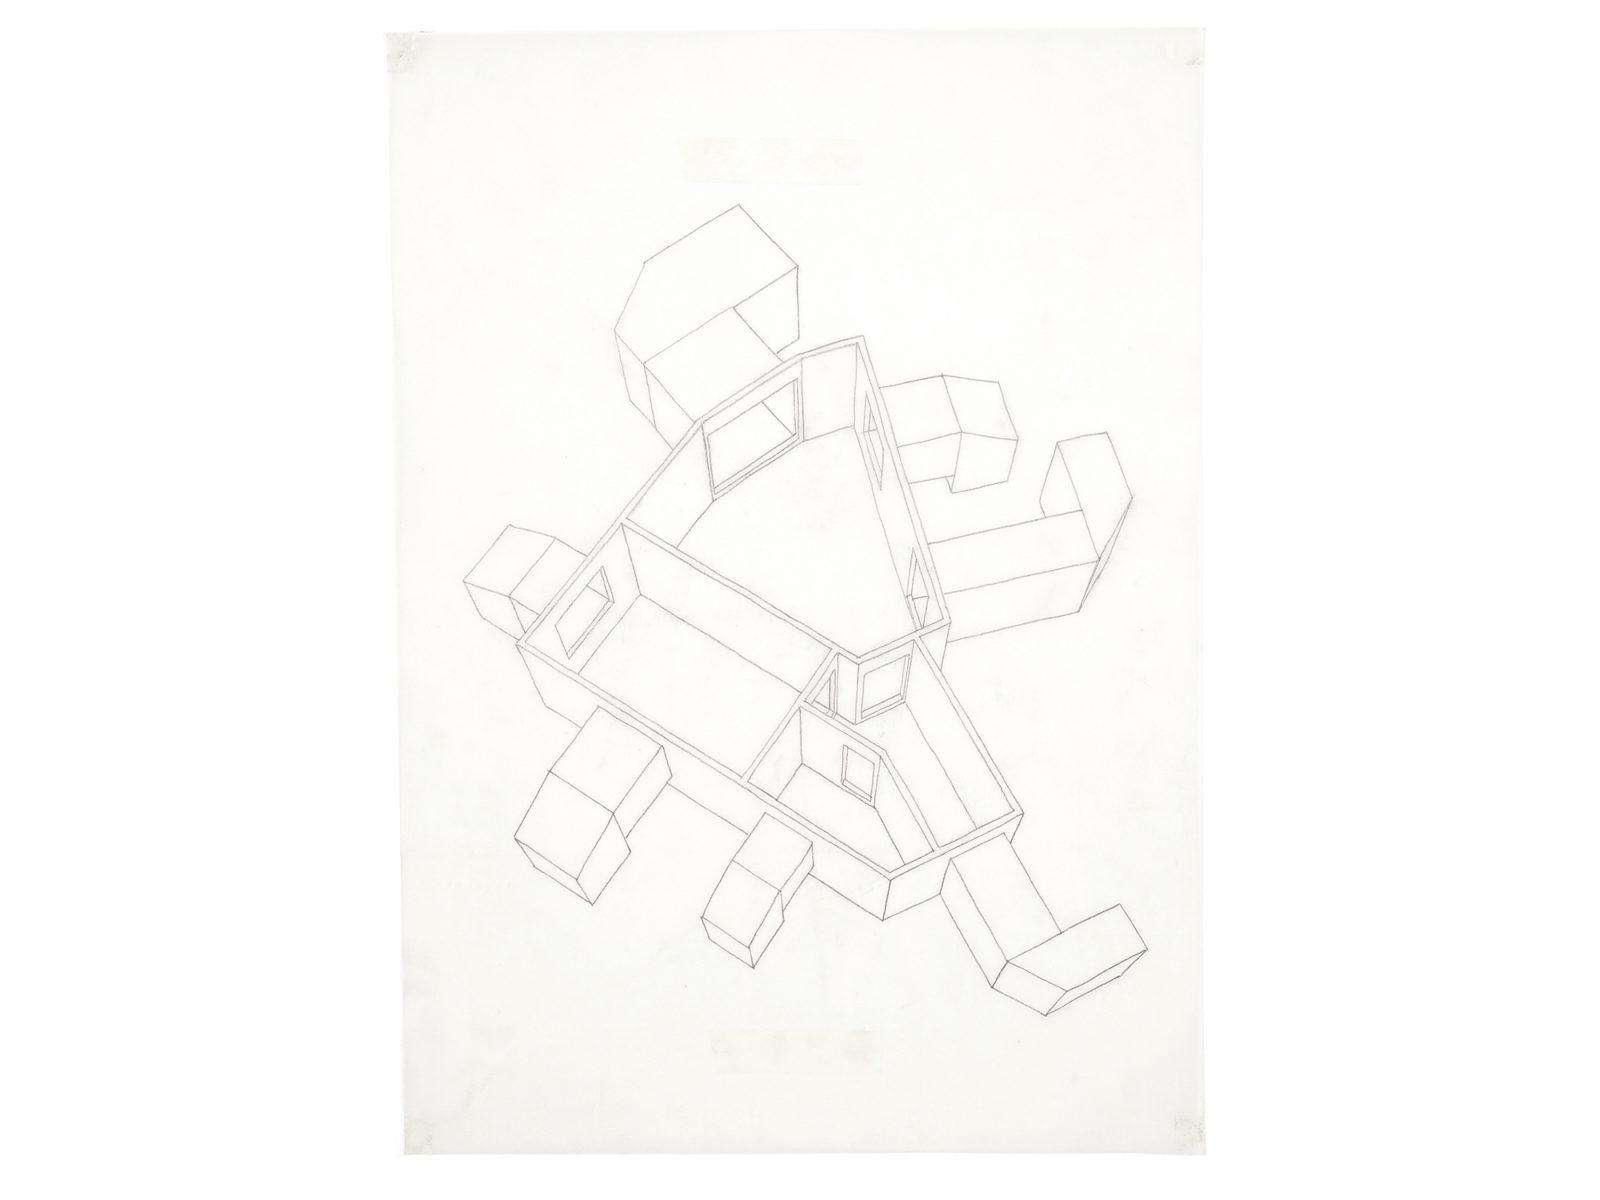 Benoit-Delaunay-artiste-dessins-2008-Correspondances-02